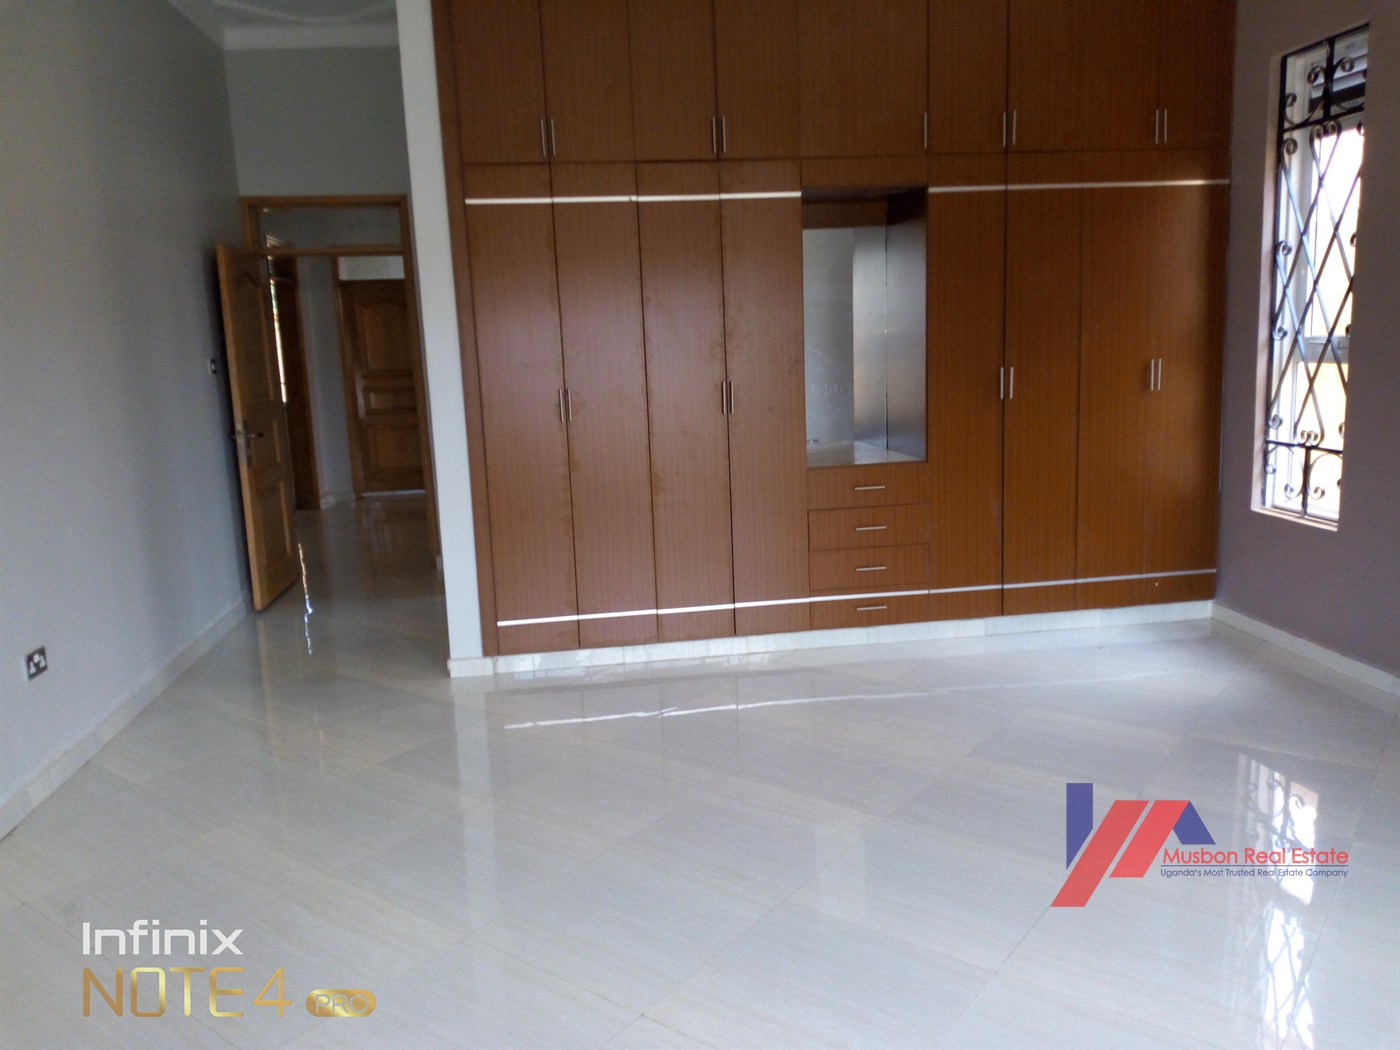 4 bedroom Mansion for sale in Kisaasi Kampala, code: 43968